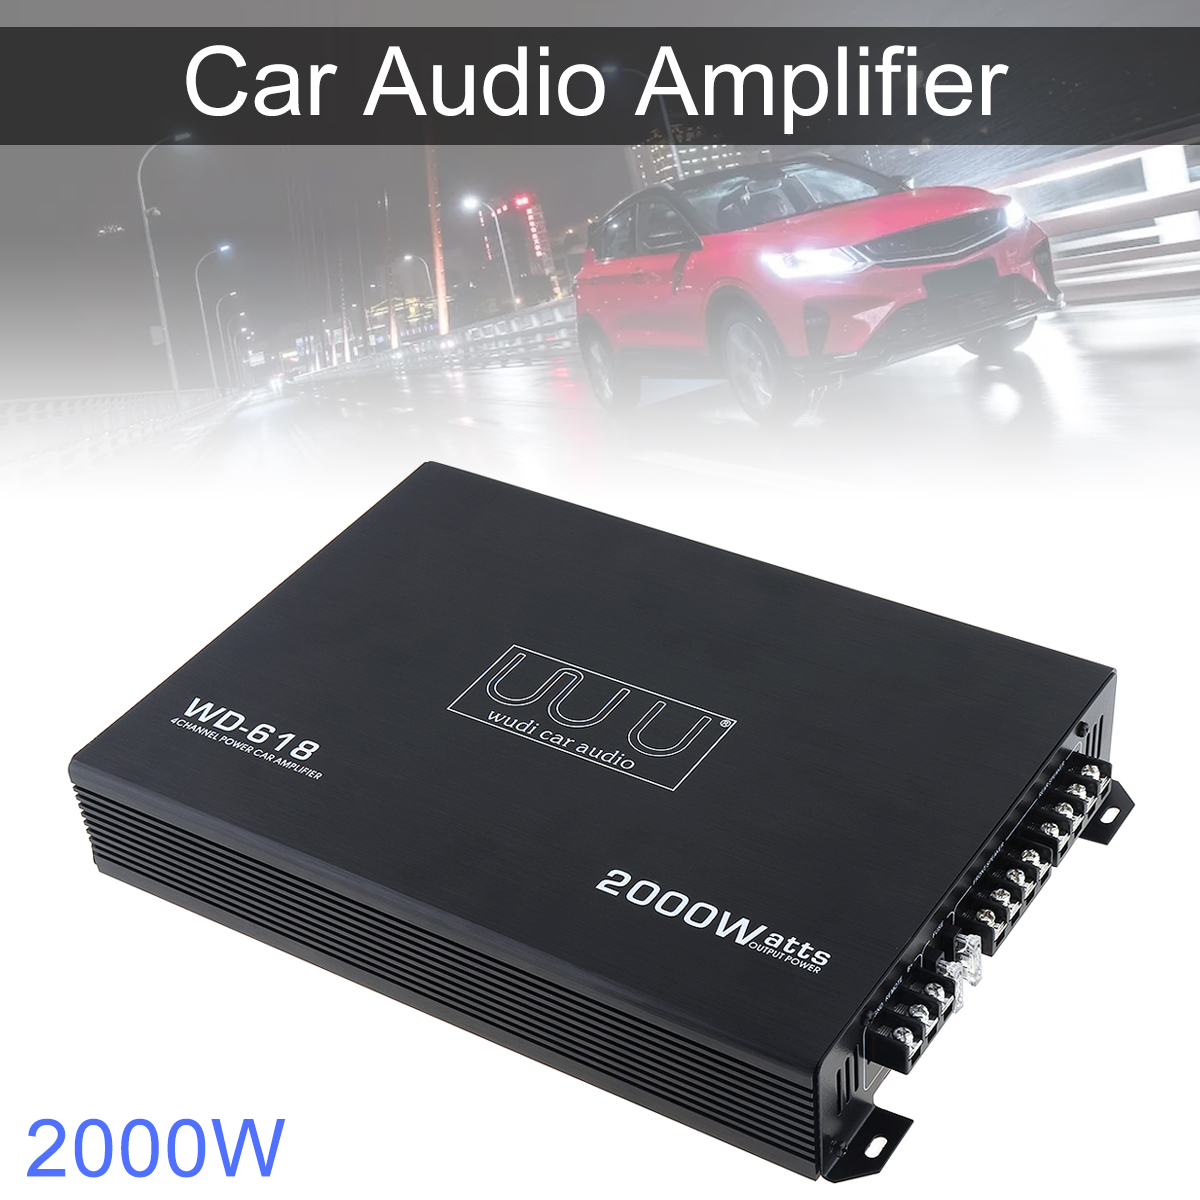 Car Audio Amplifier 2000W Class AB Digital 4 Channel Black Aluminum Alloy High Power Car Stereo Amplifiers for Car Home Audio